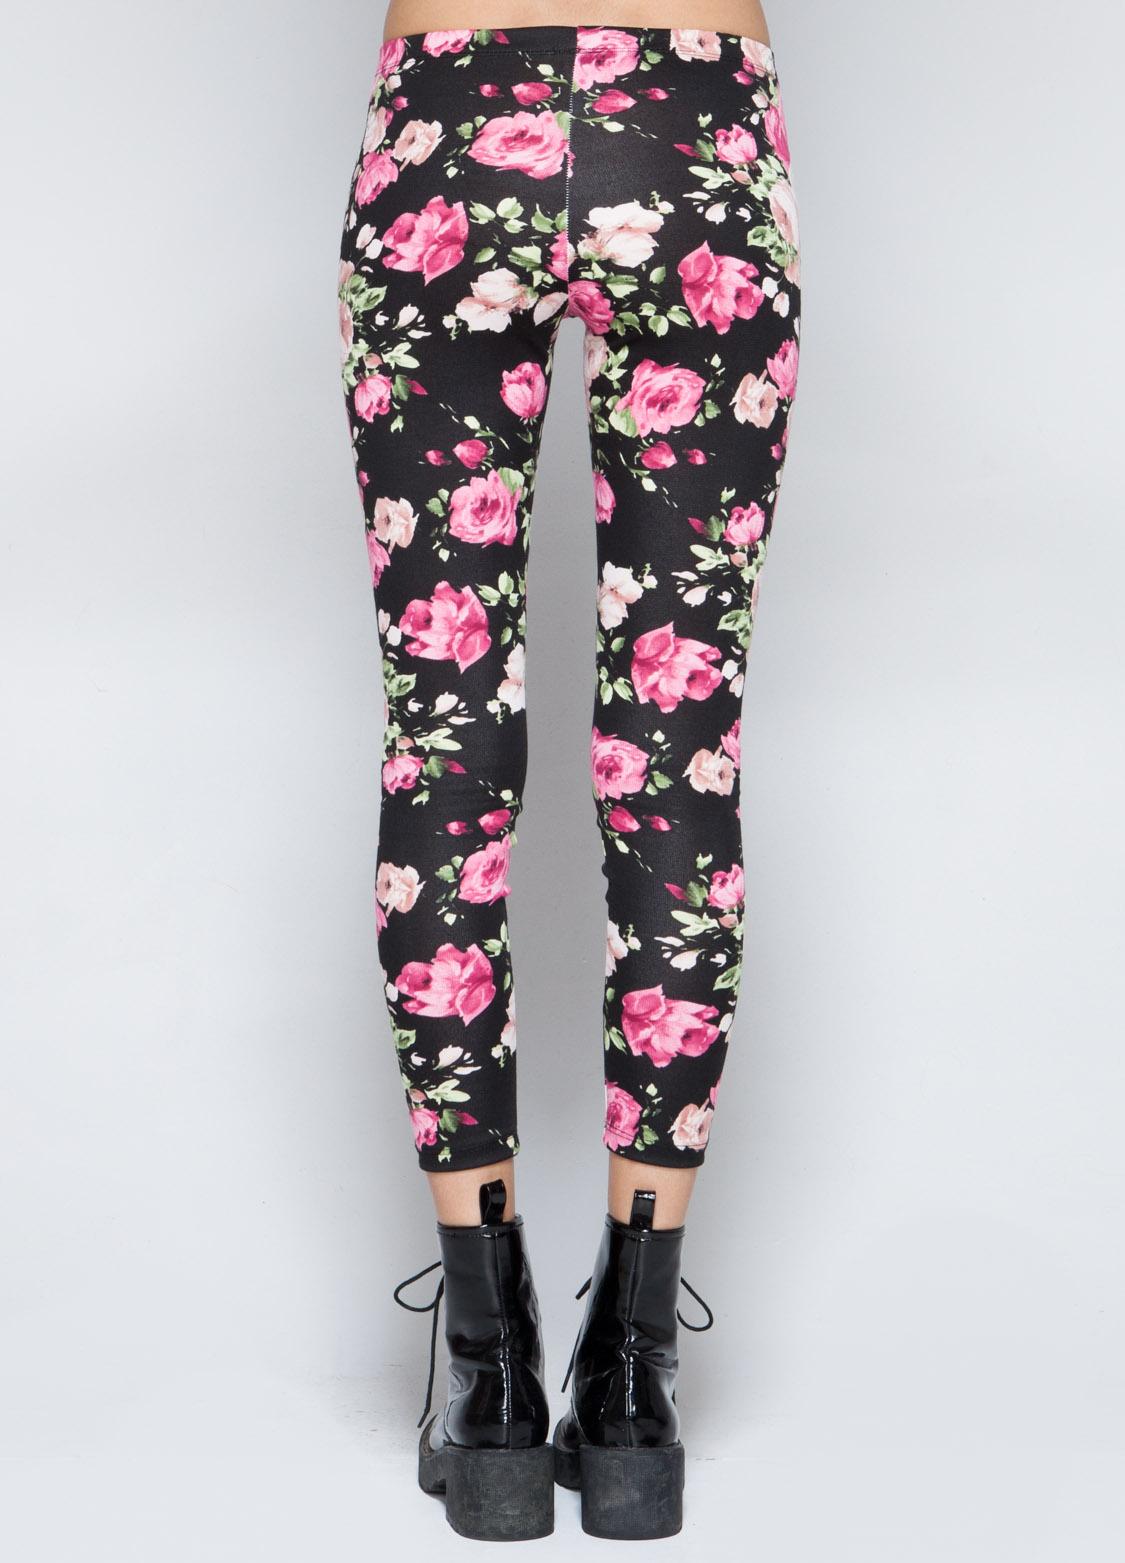 Astounding Floral Leggings Tumblr Contemporary - Best Image Engine ...